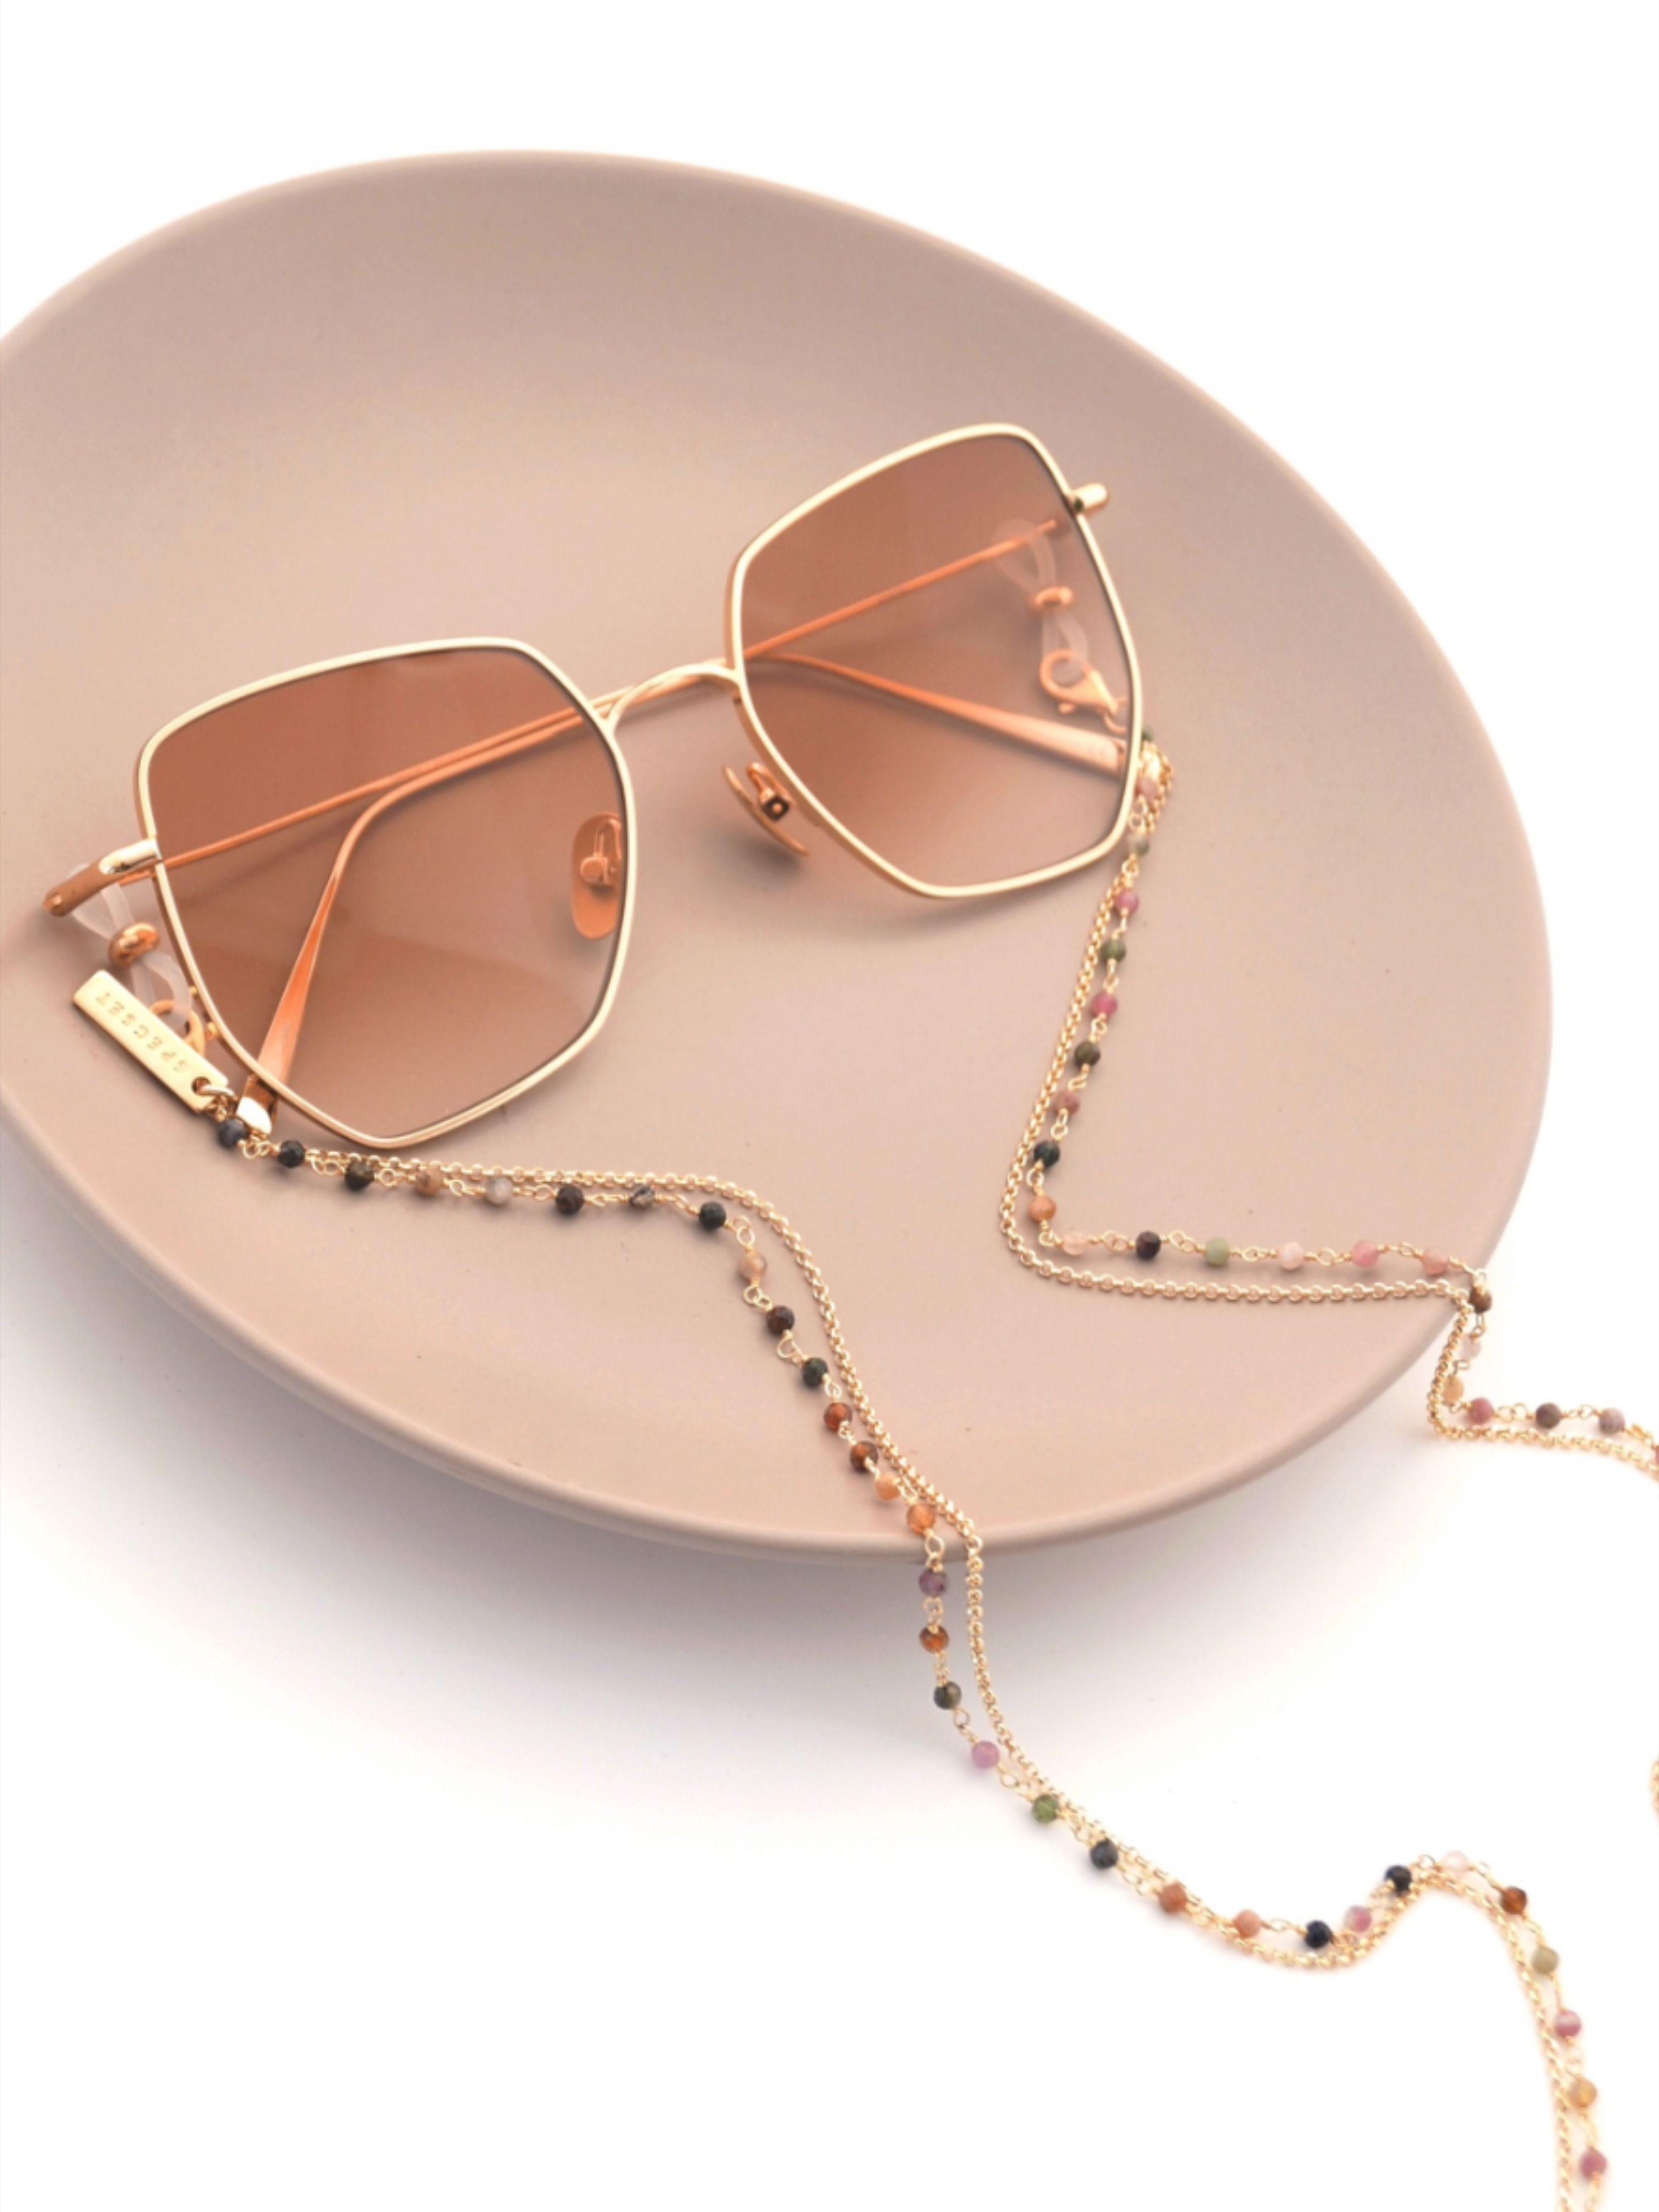 Gold Tourmaline Eyeglass Chain Double Gold Glasses Chain | Etsy | Eyeglass  chain, Eyeglass jewelry, Sunglass chain